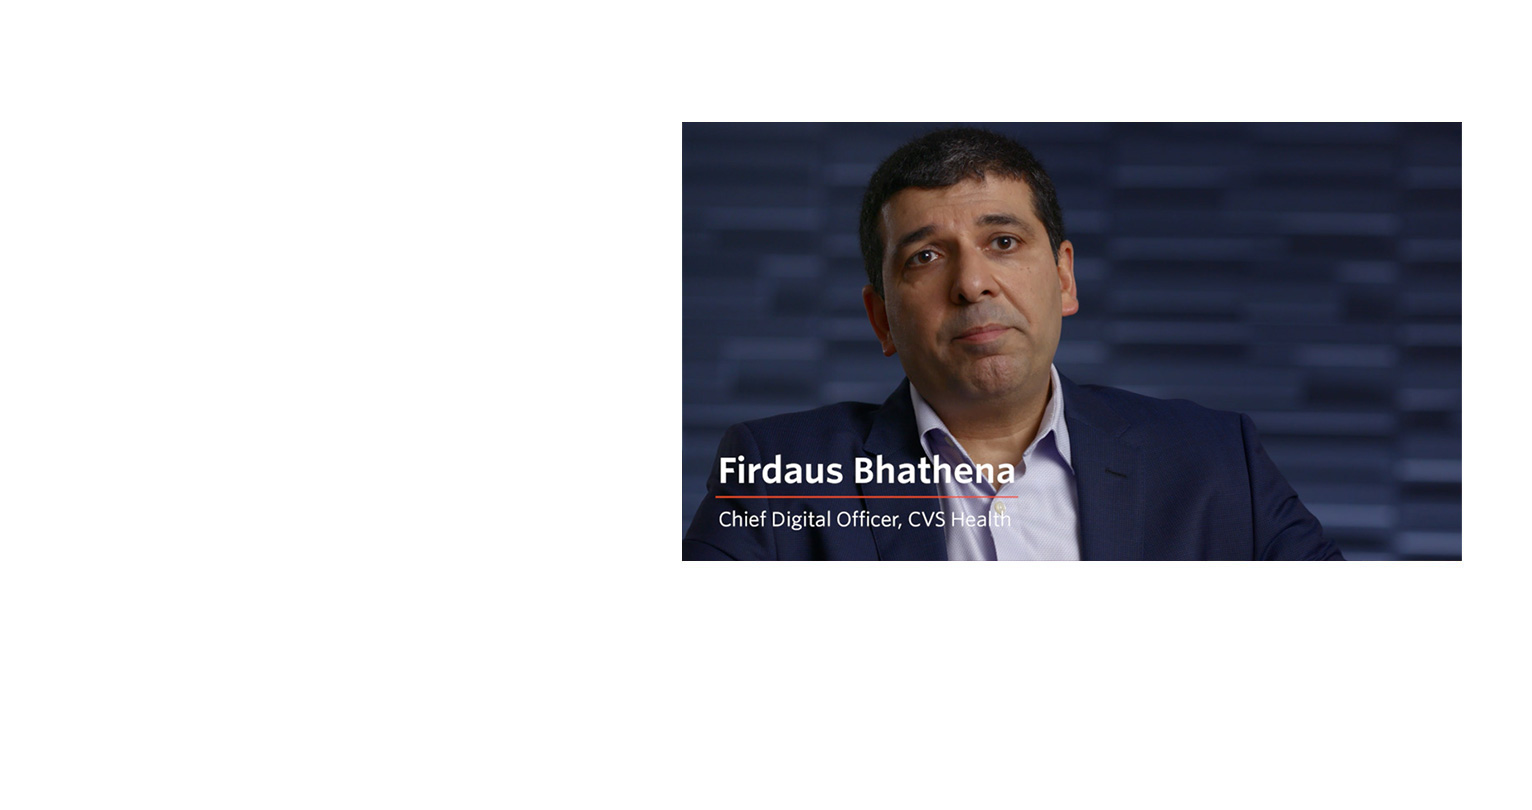 Firdaus Bhathena Video Thumbnail